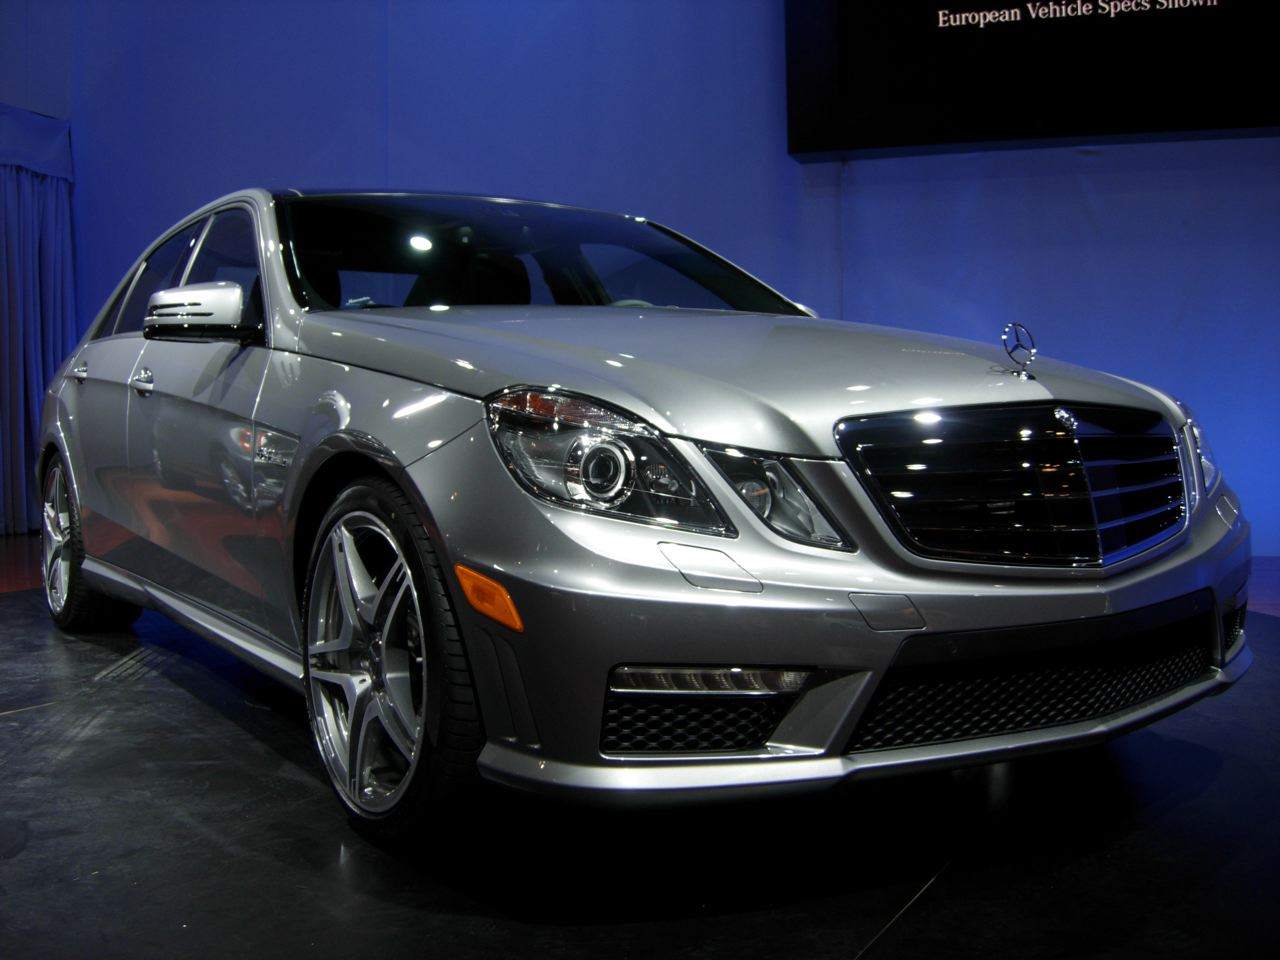 Mercedes-Benz's giant balls